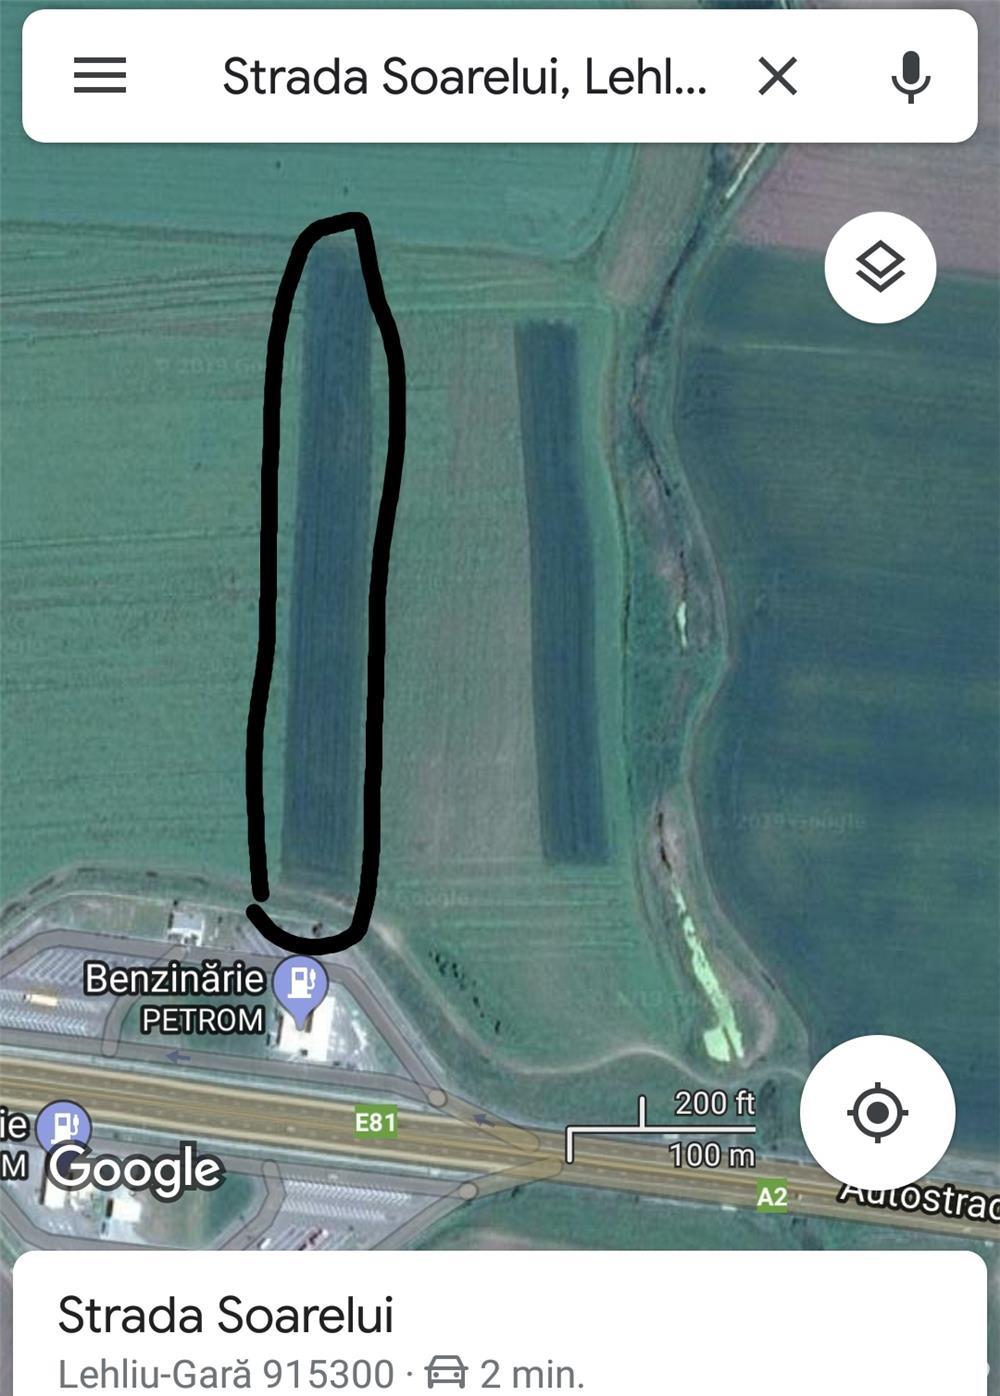 Vând teren extravilan lângă Autostrada A2